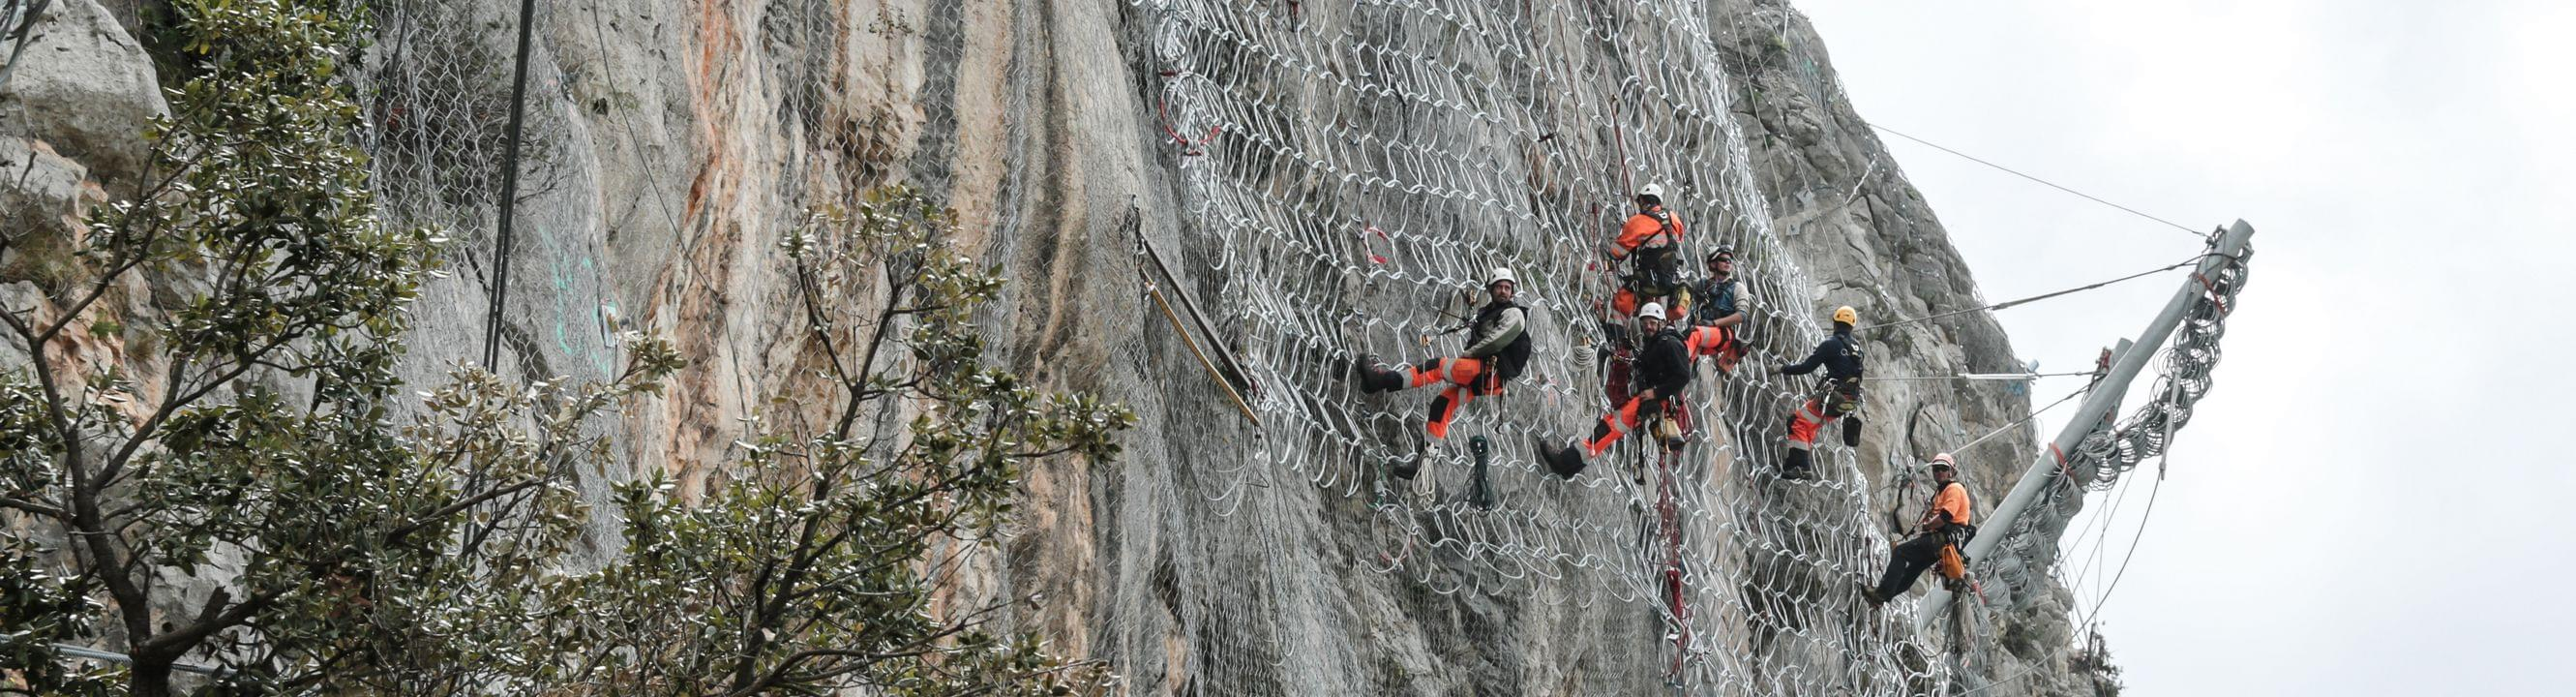 technicien cordiste interim interimaire tp 06 acts interim mission gilette paca alpes maritimes